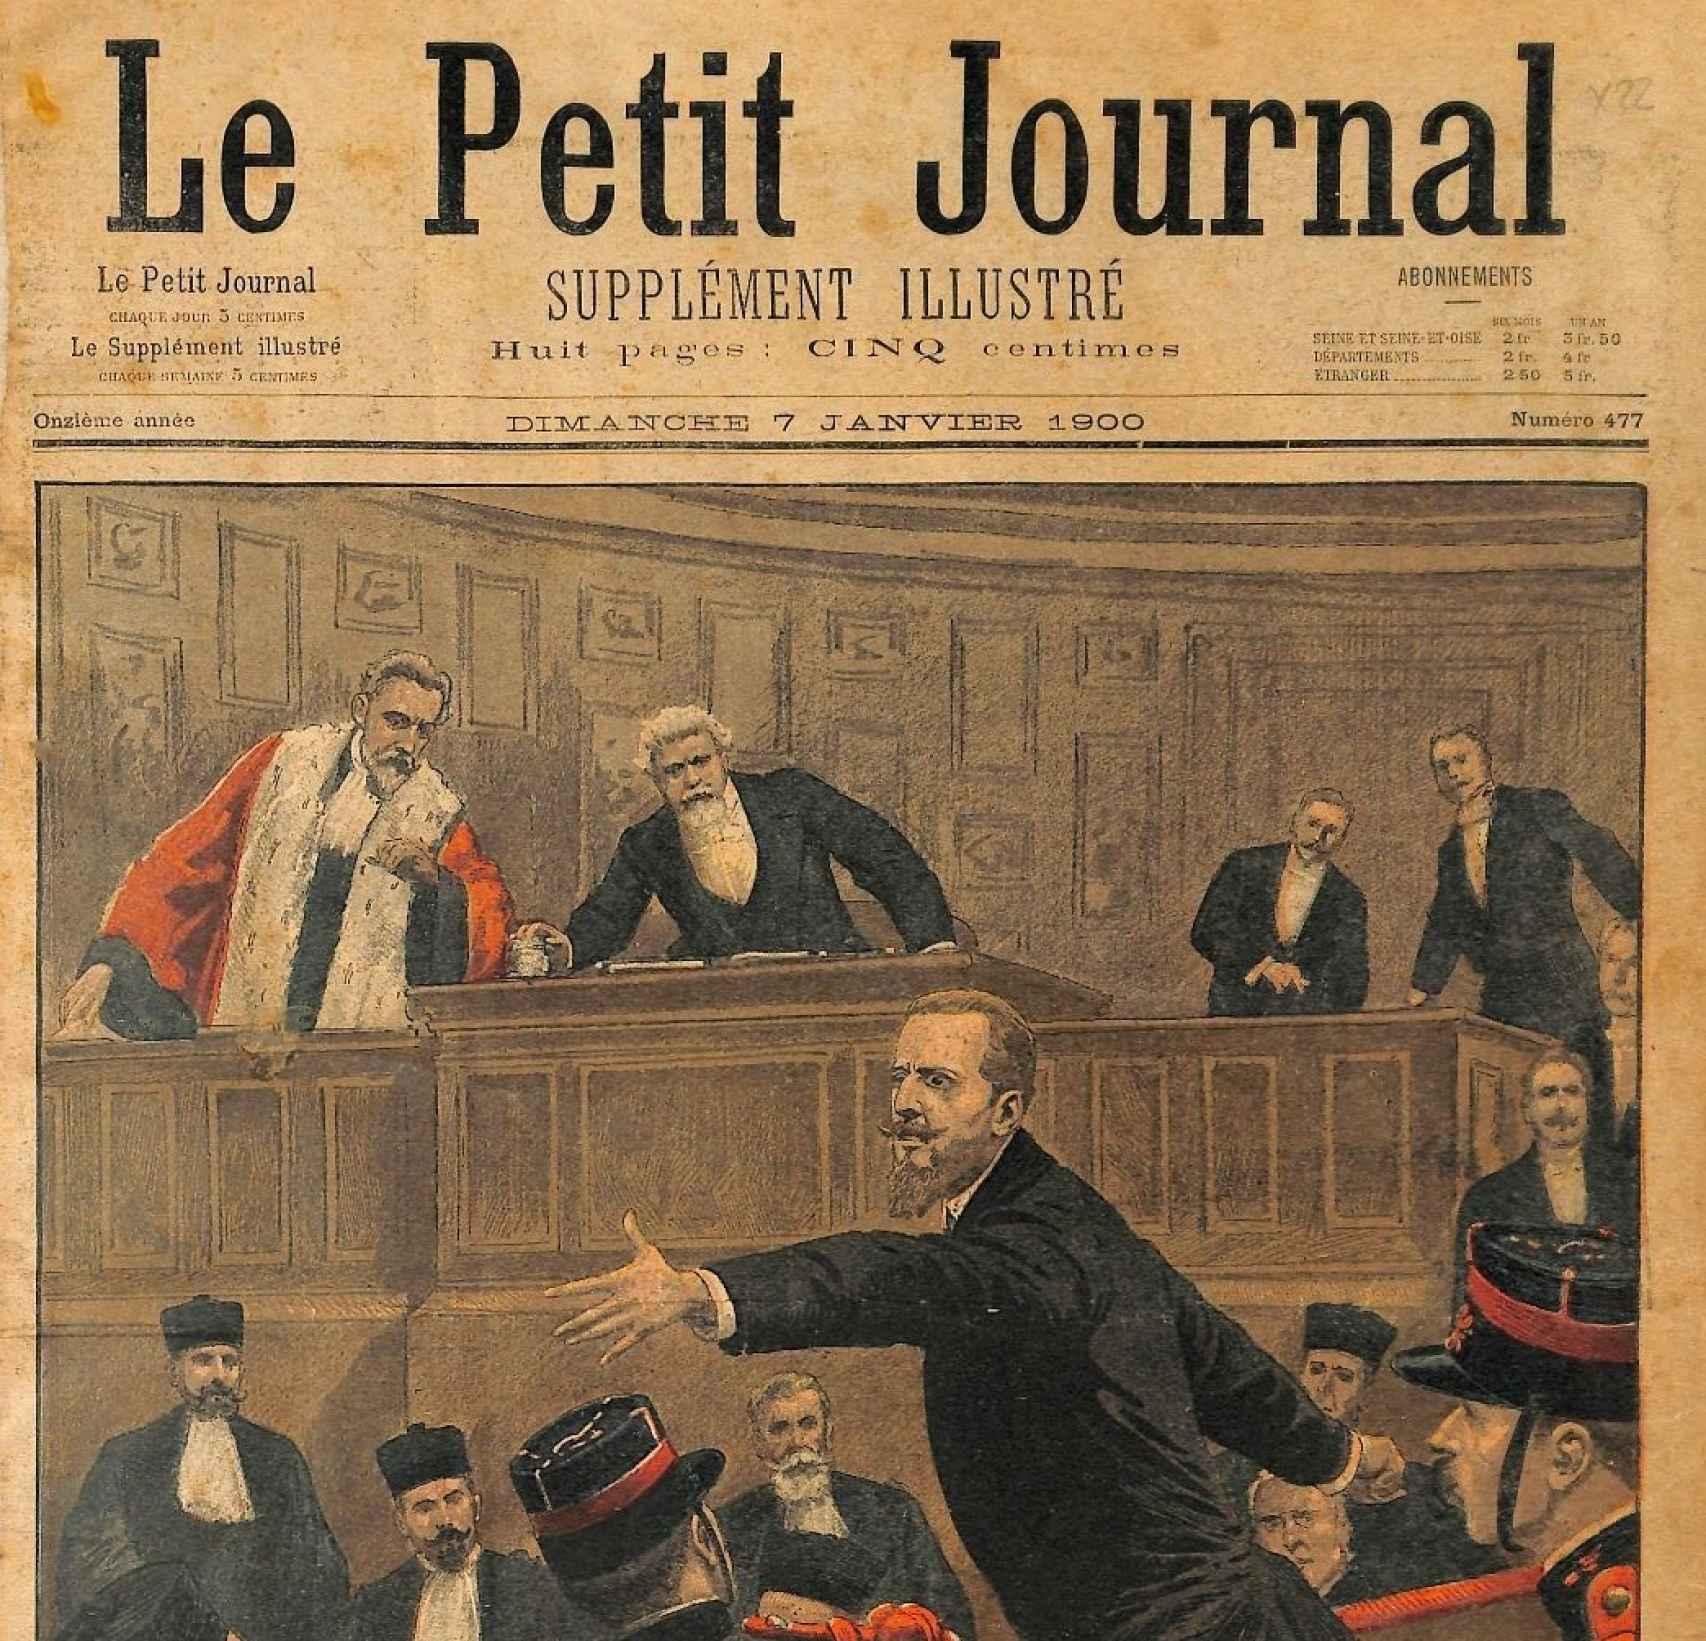 El diario Le Petit Journal.